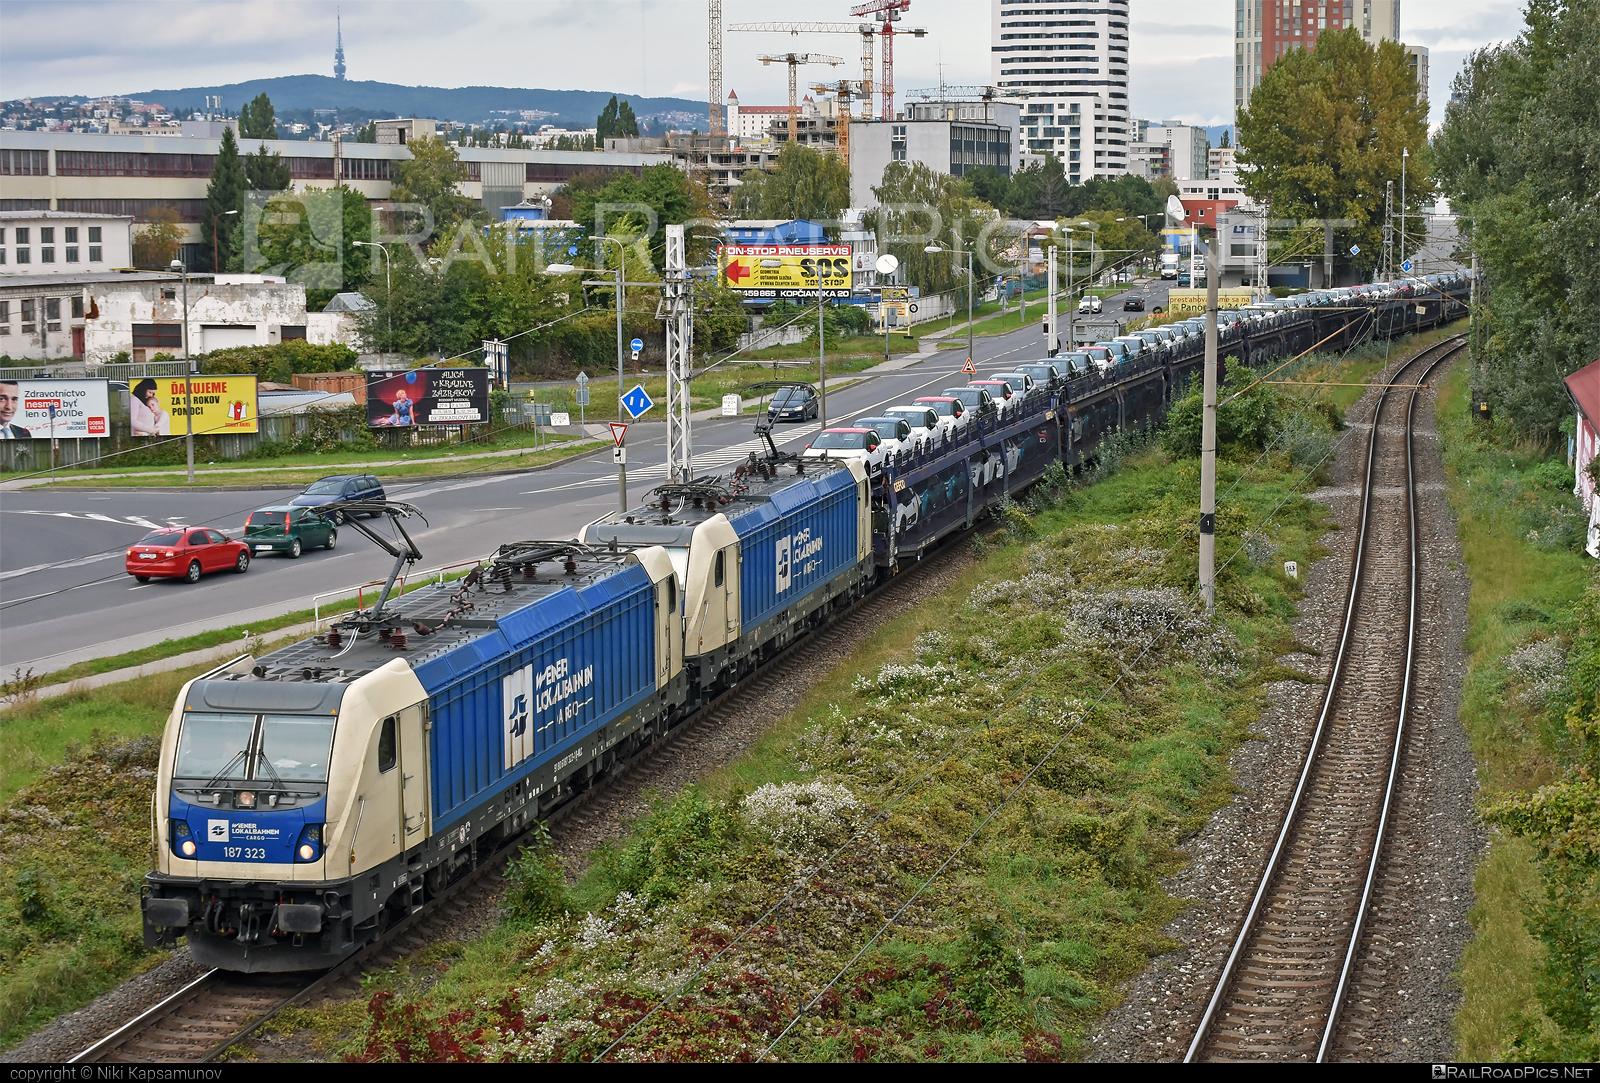 Bombardier TRAXX F160 AC3 - 187 323 operated by Wiener Lokalbahnen Cargo GmbH #bombardier #bombardiertraxx #traxx #traxxf160 #traxxf160ac #traxxf160ac3 #wienerlokalbahnencargo #wienerlokalbahnencargogmbh #wlc